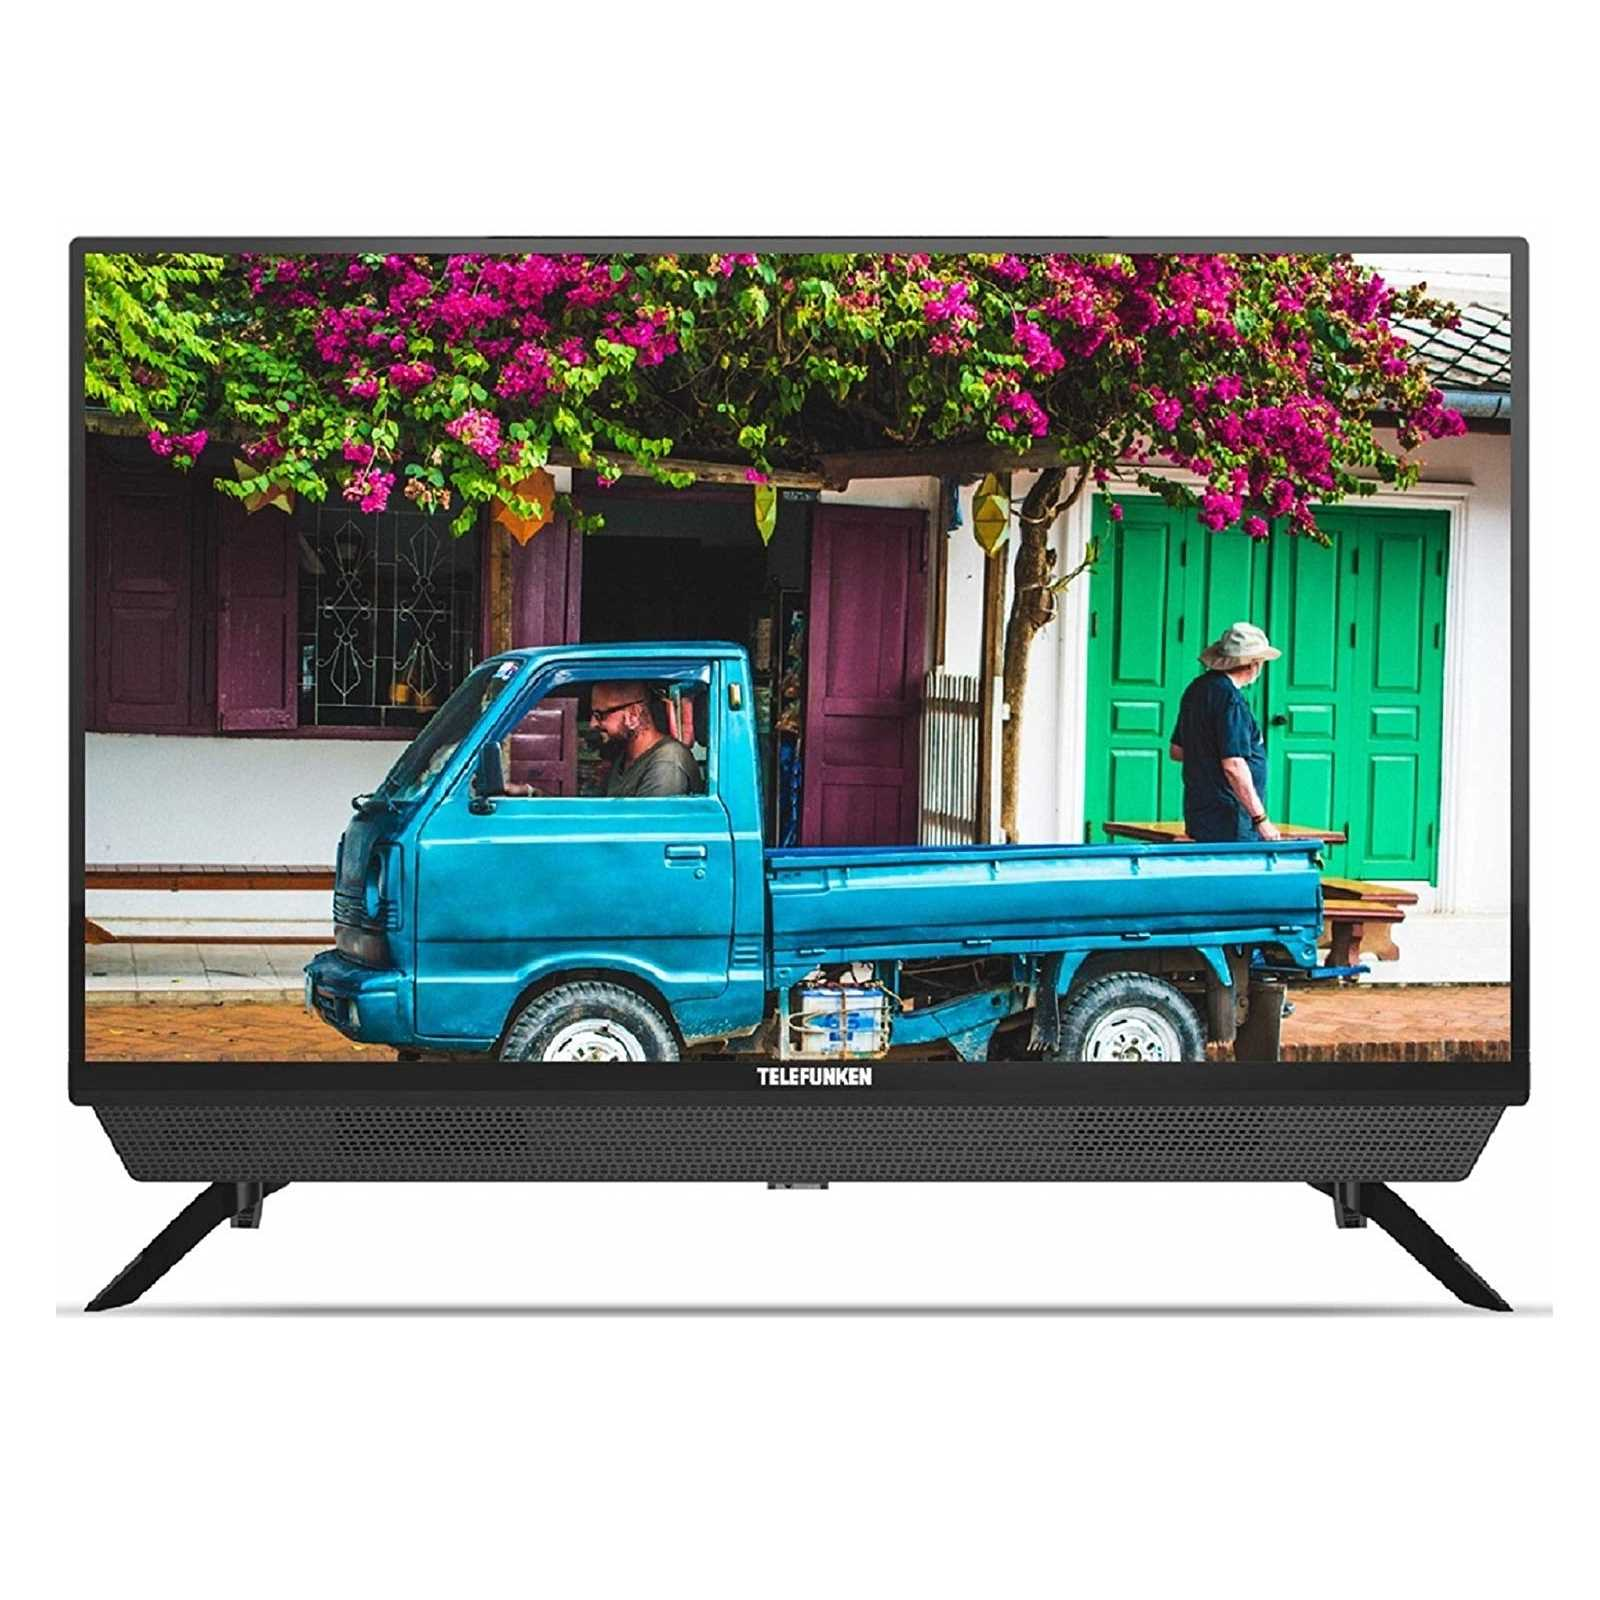 Telefunken TFK32N 32 Inch HD Ready LED Television